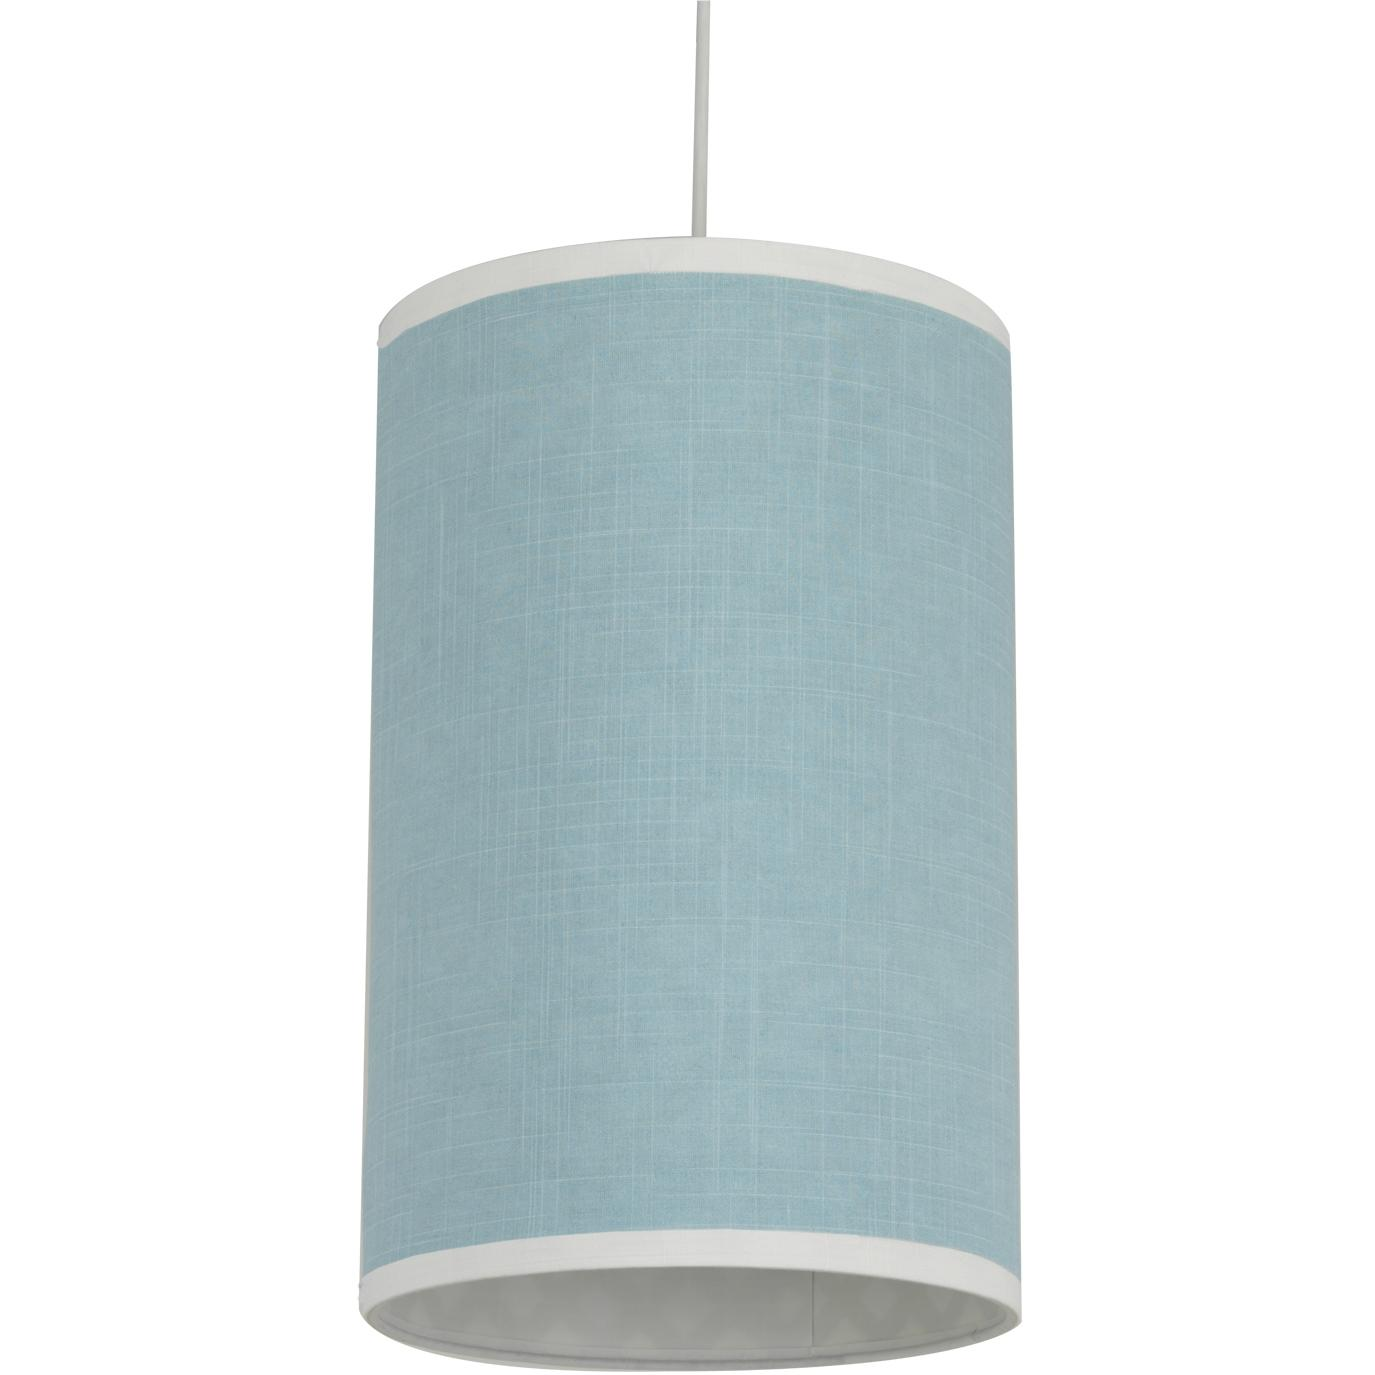 Oilo Cylinder Hanging Lamp - Raindrops Aqua Solid